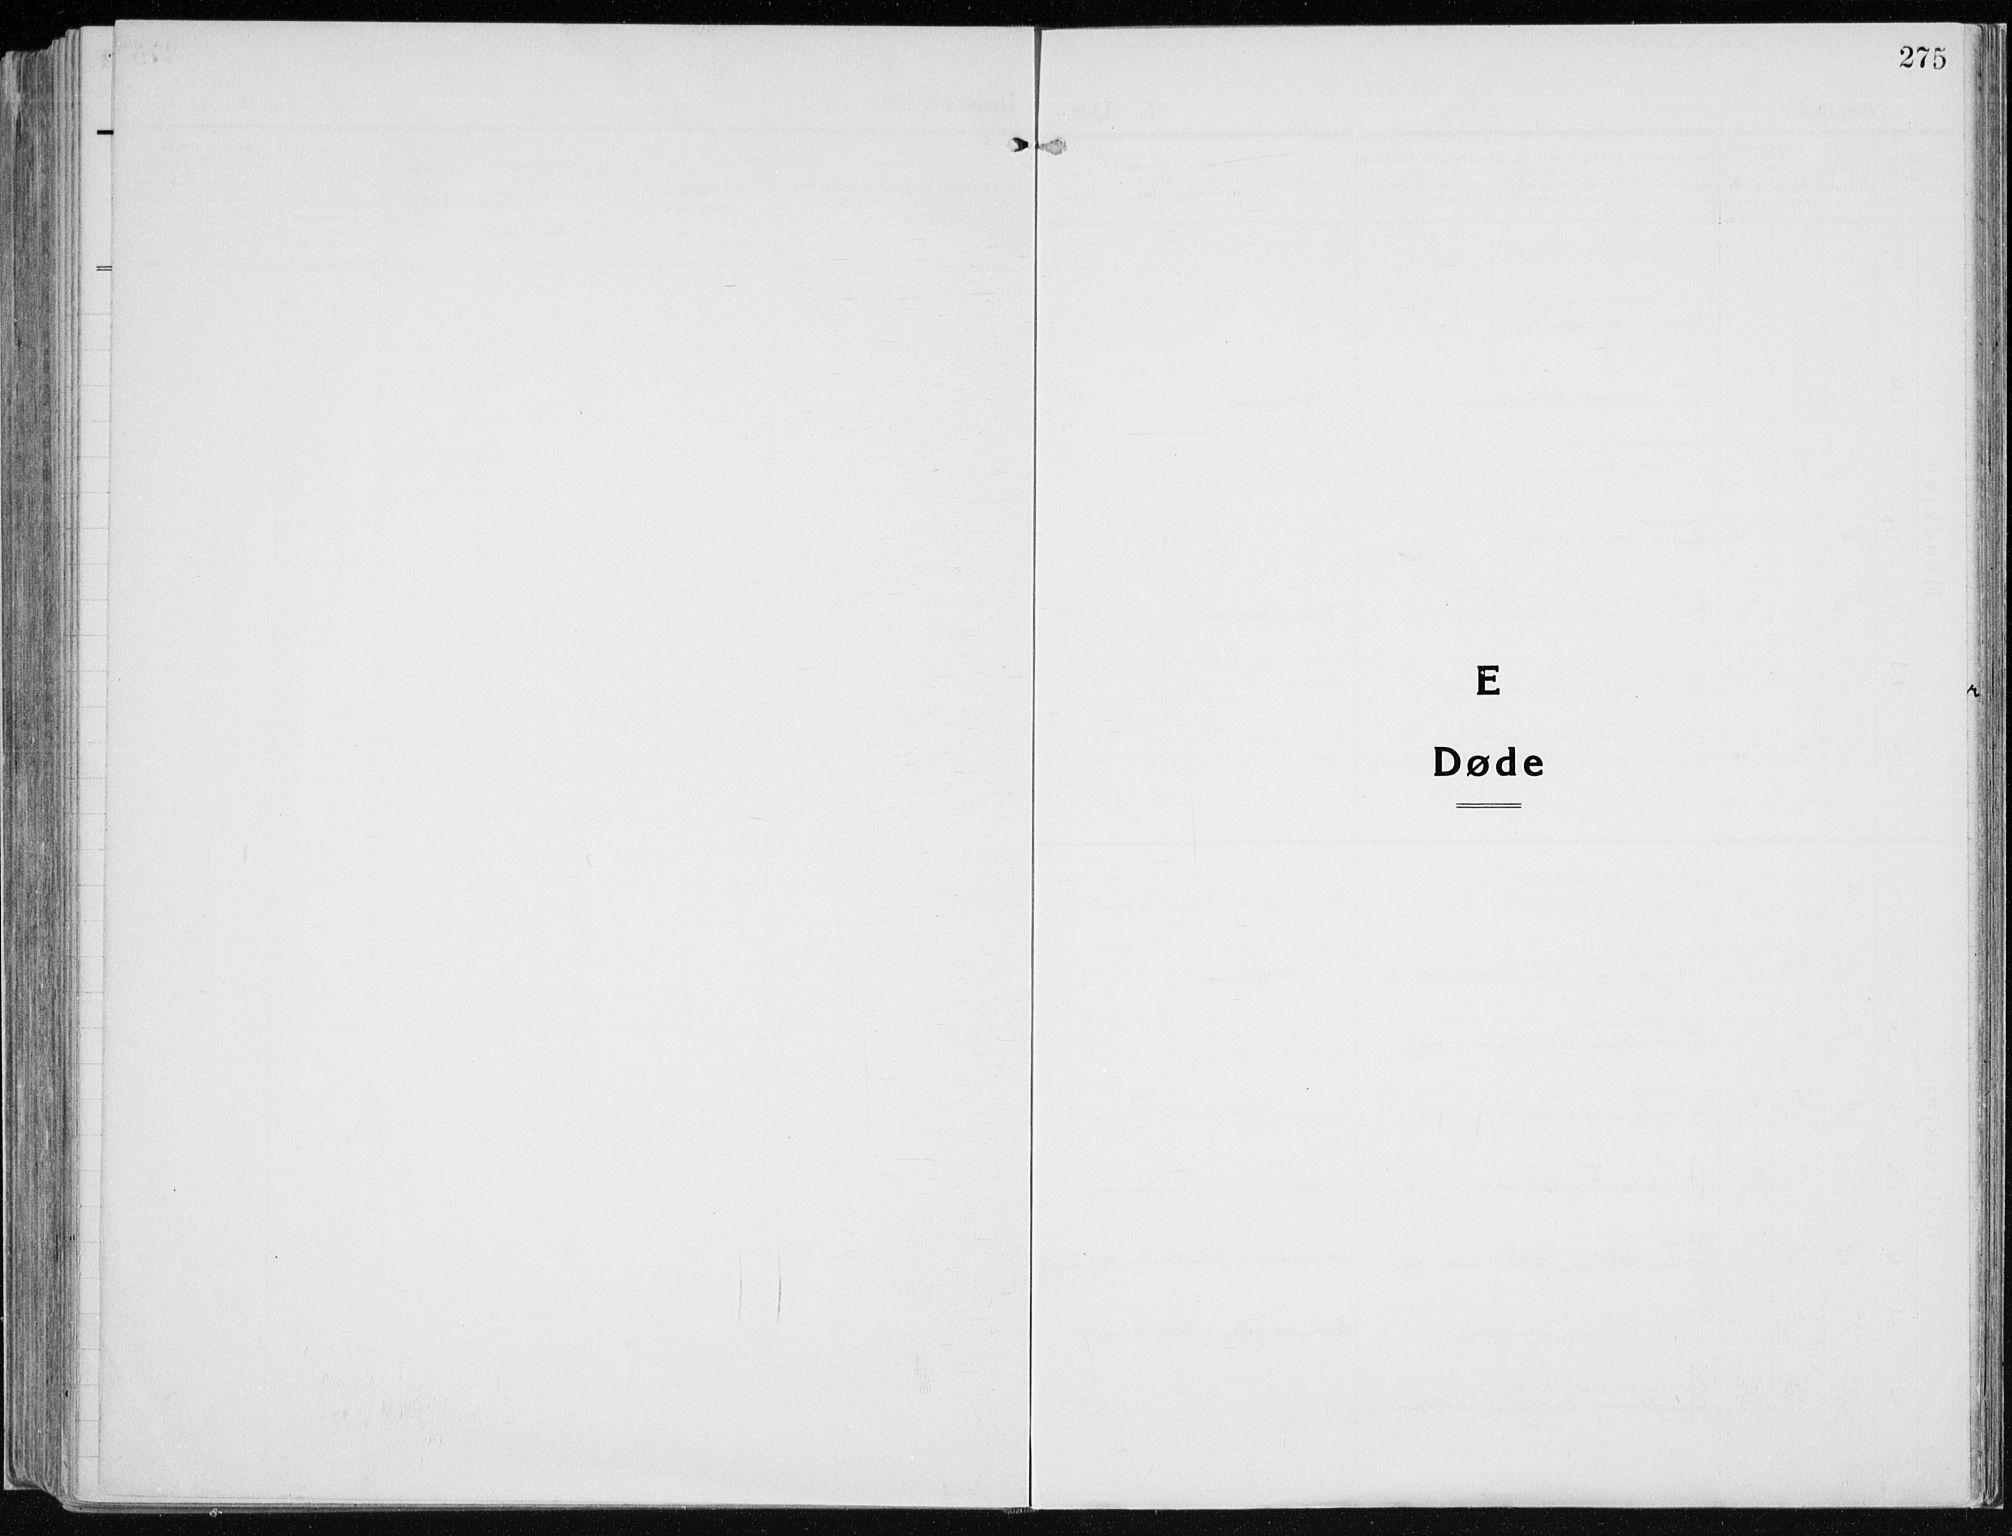 SAH, Vardal prestekontor, H/Ha/Haa/L0015: Ministerialbok nr. 15, 1923-1937, s. 275